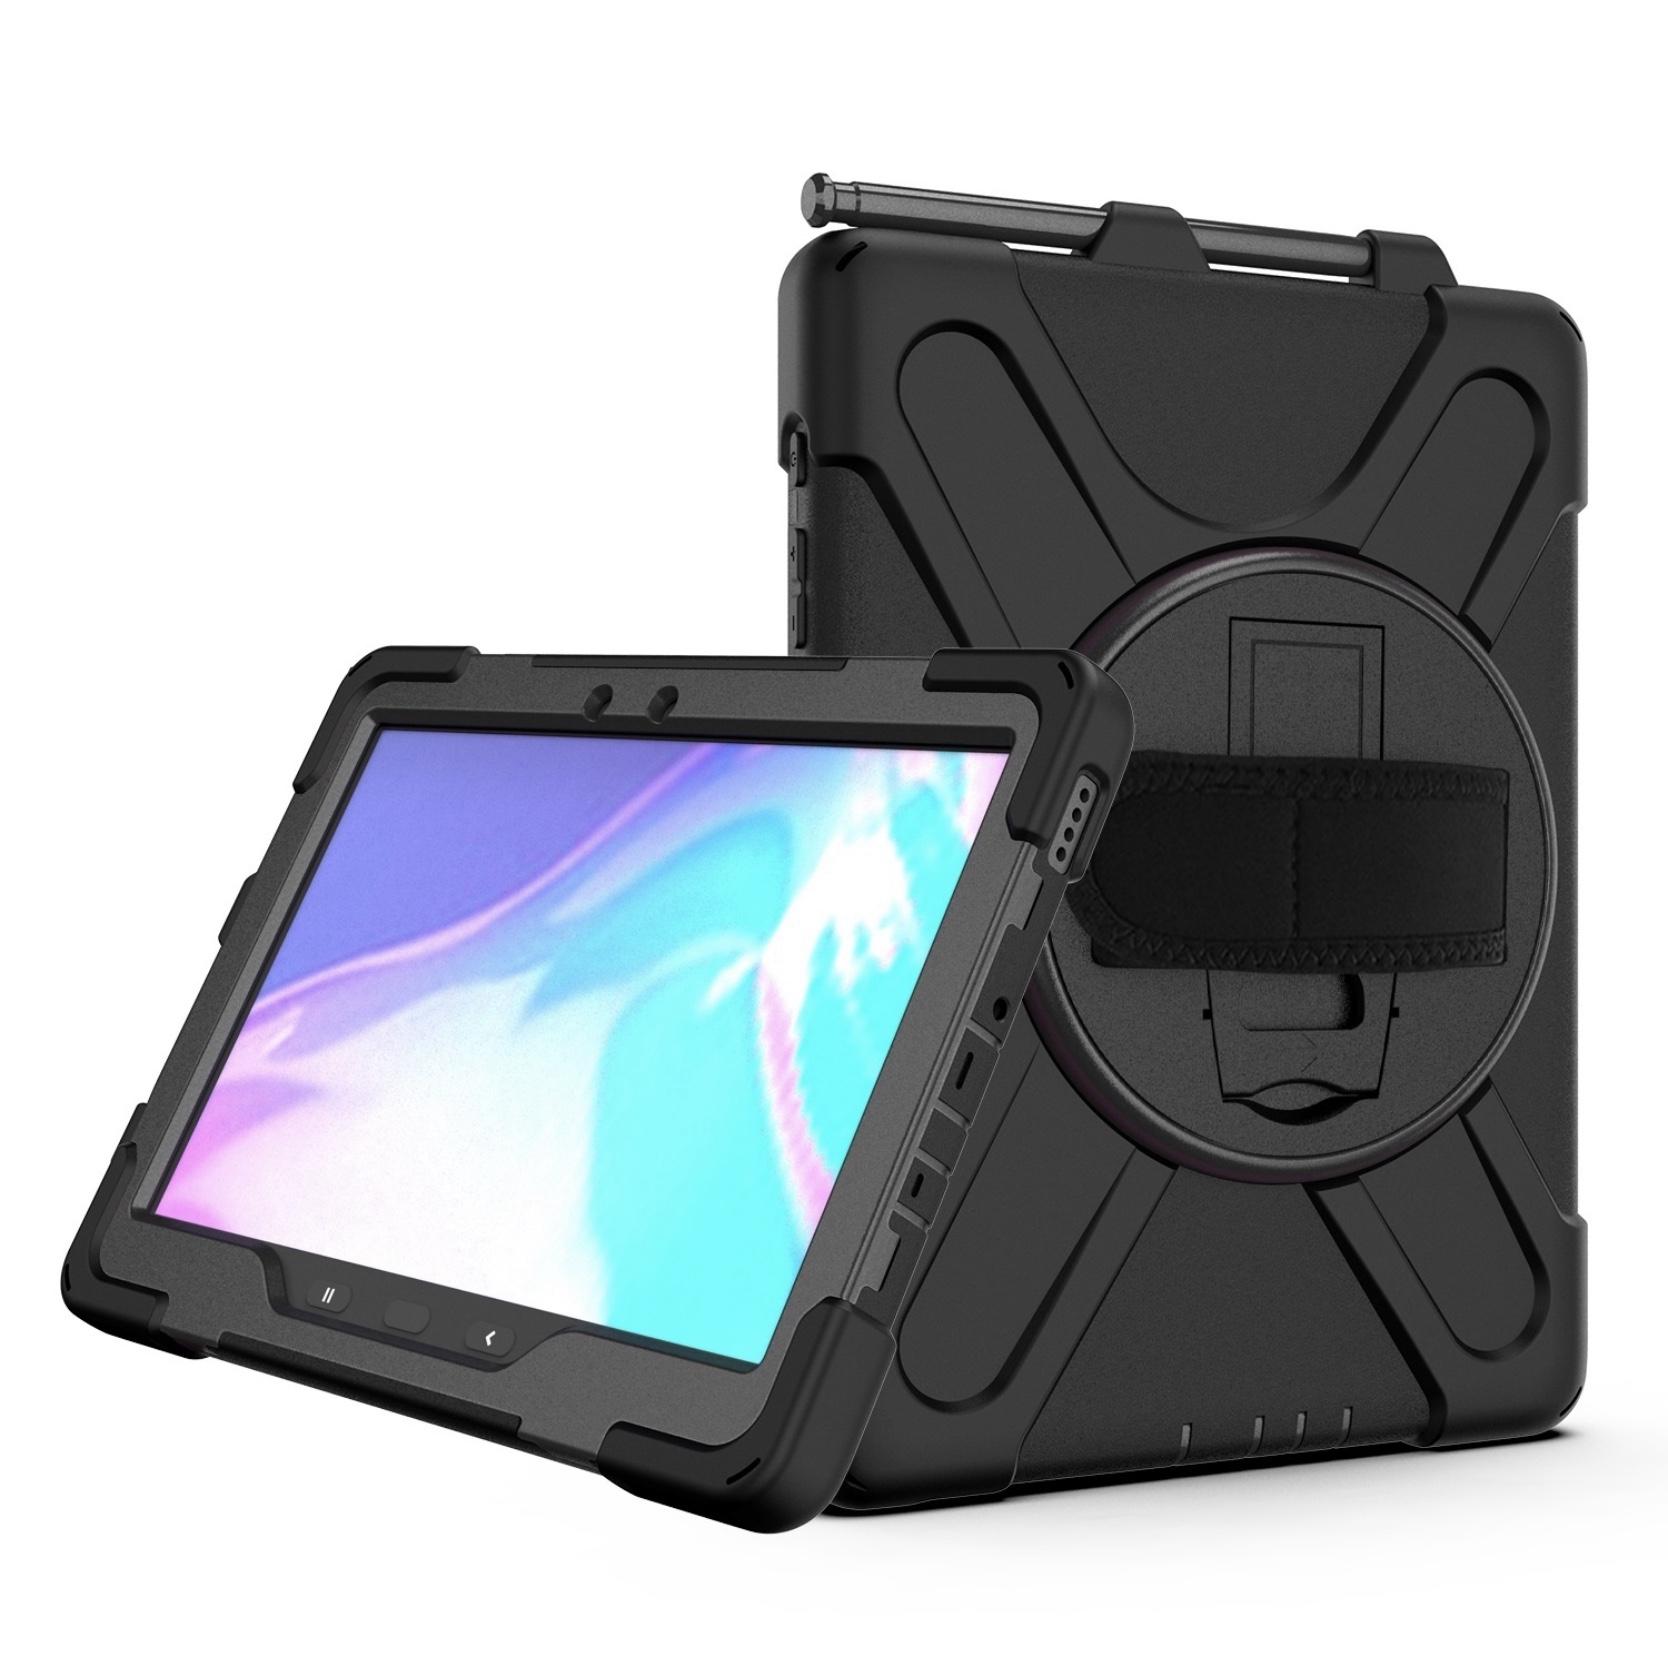 Bundle 3 en 1 Samsung Galaxy TAB ACTIVE PRO 10.1 Coque renforcee Support Stylet et sangle main